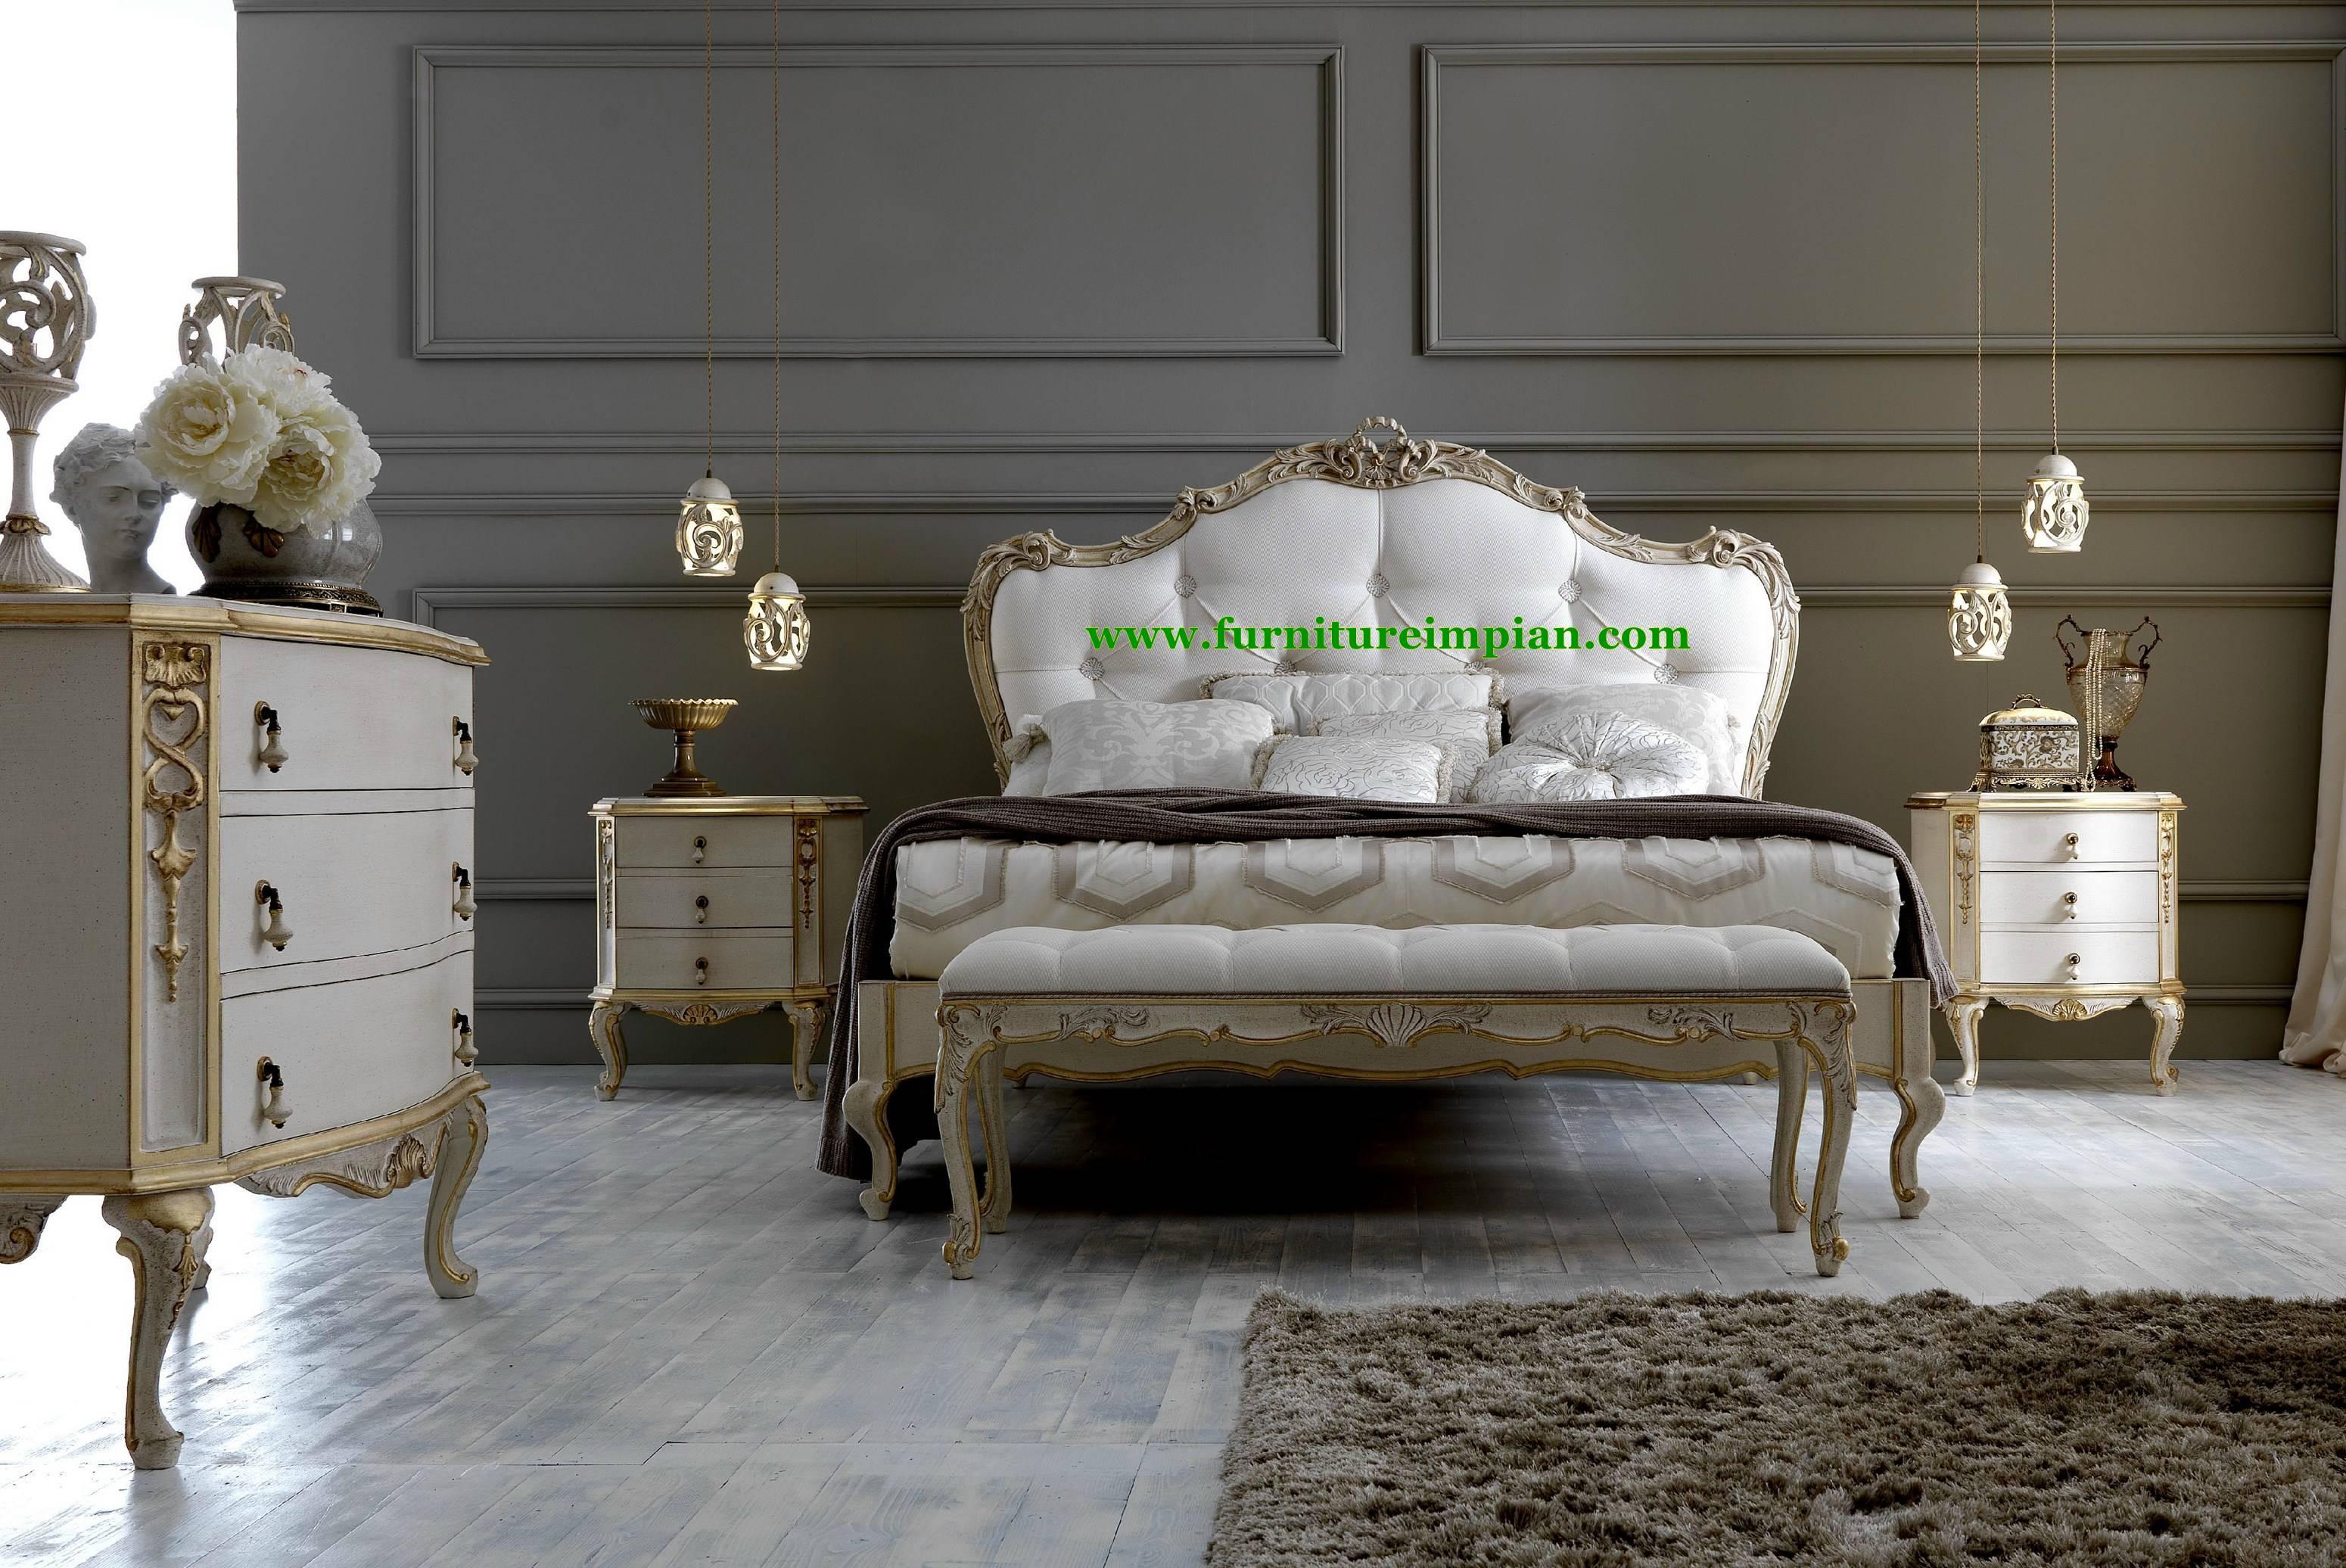 kamar tidur creed furniture impian rumah idaman